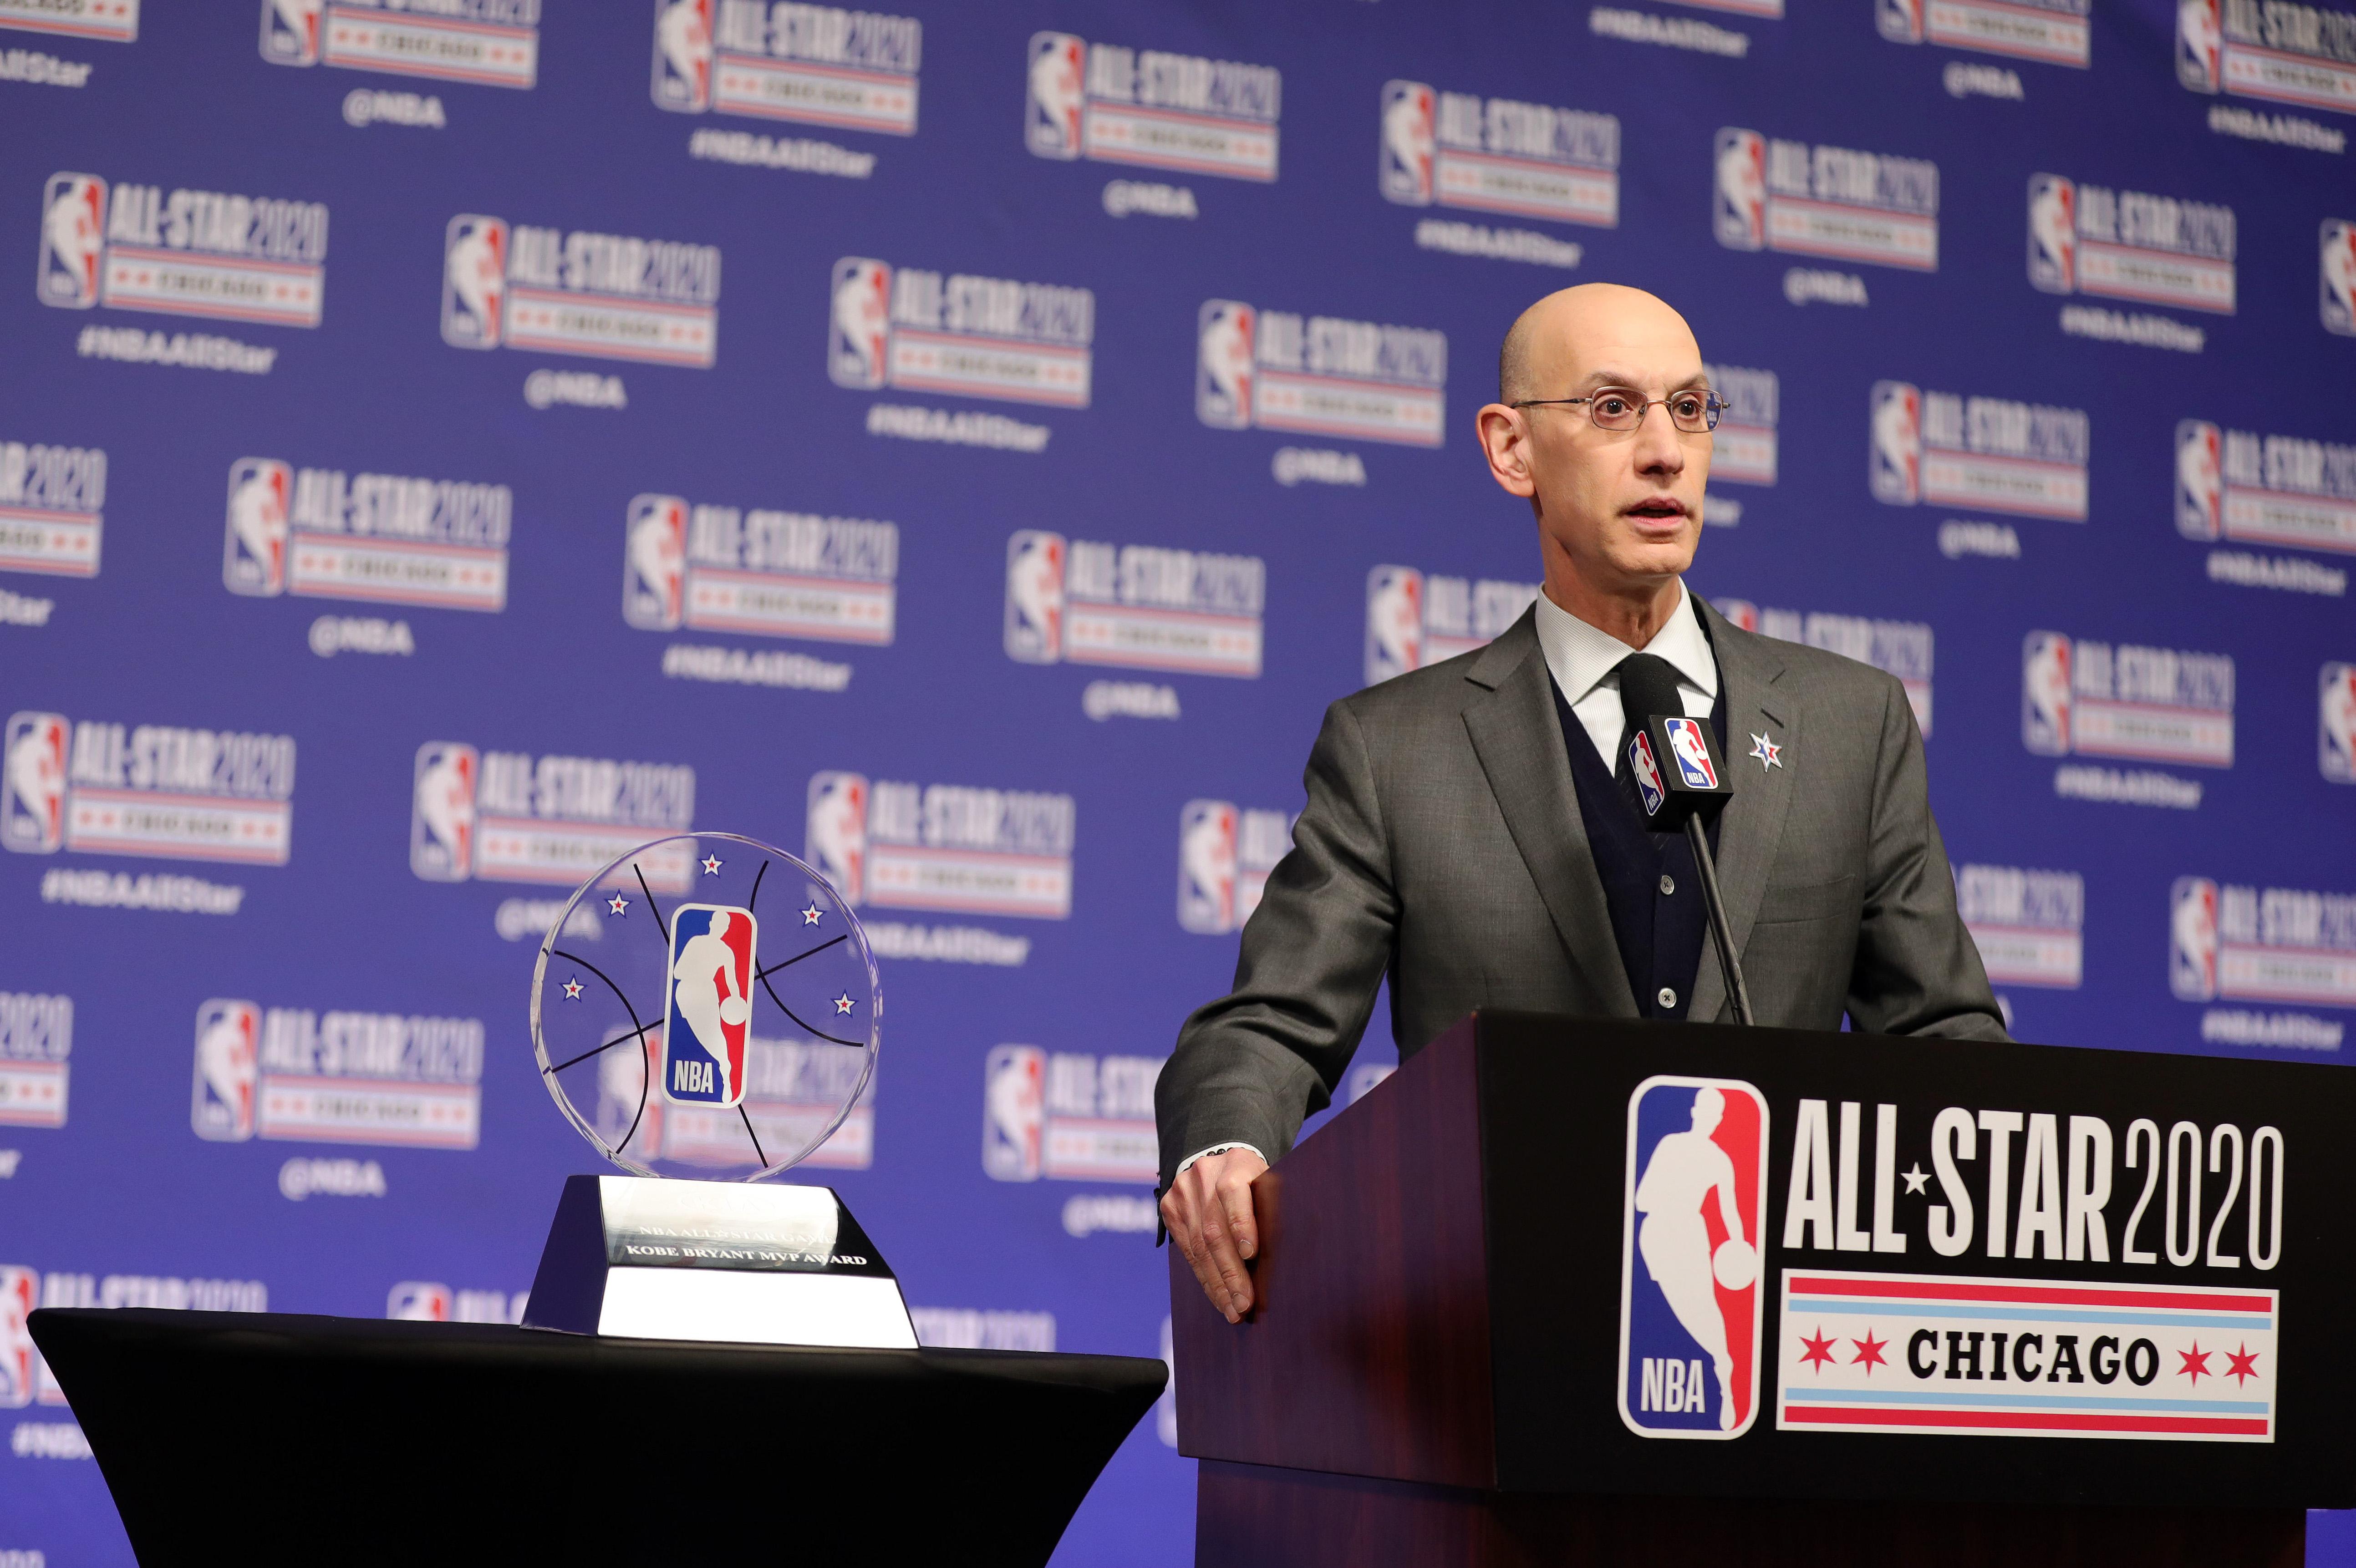 Basket - NBA - Coronavirus: la NBA étudie tous les scénarios de reprise